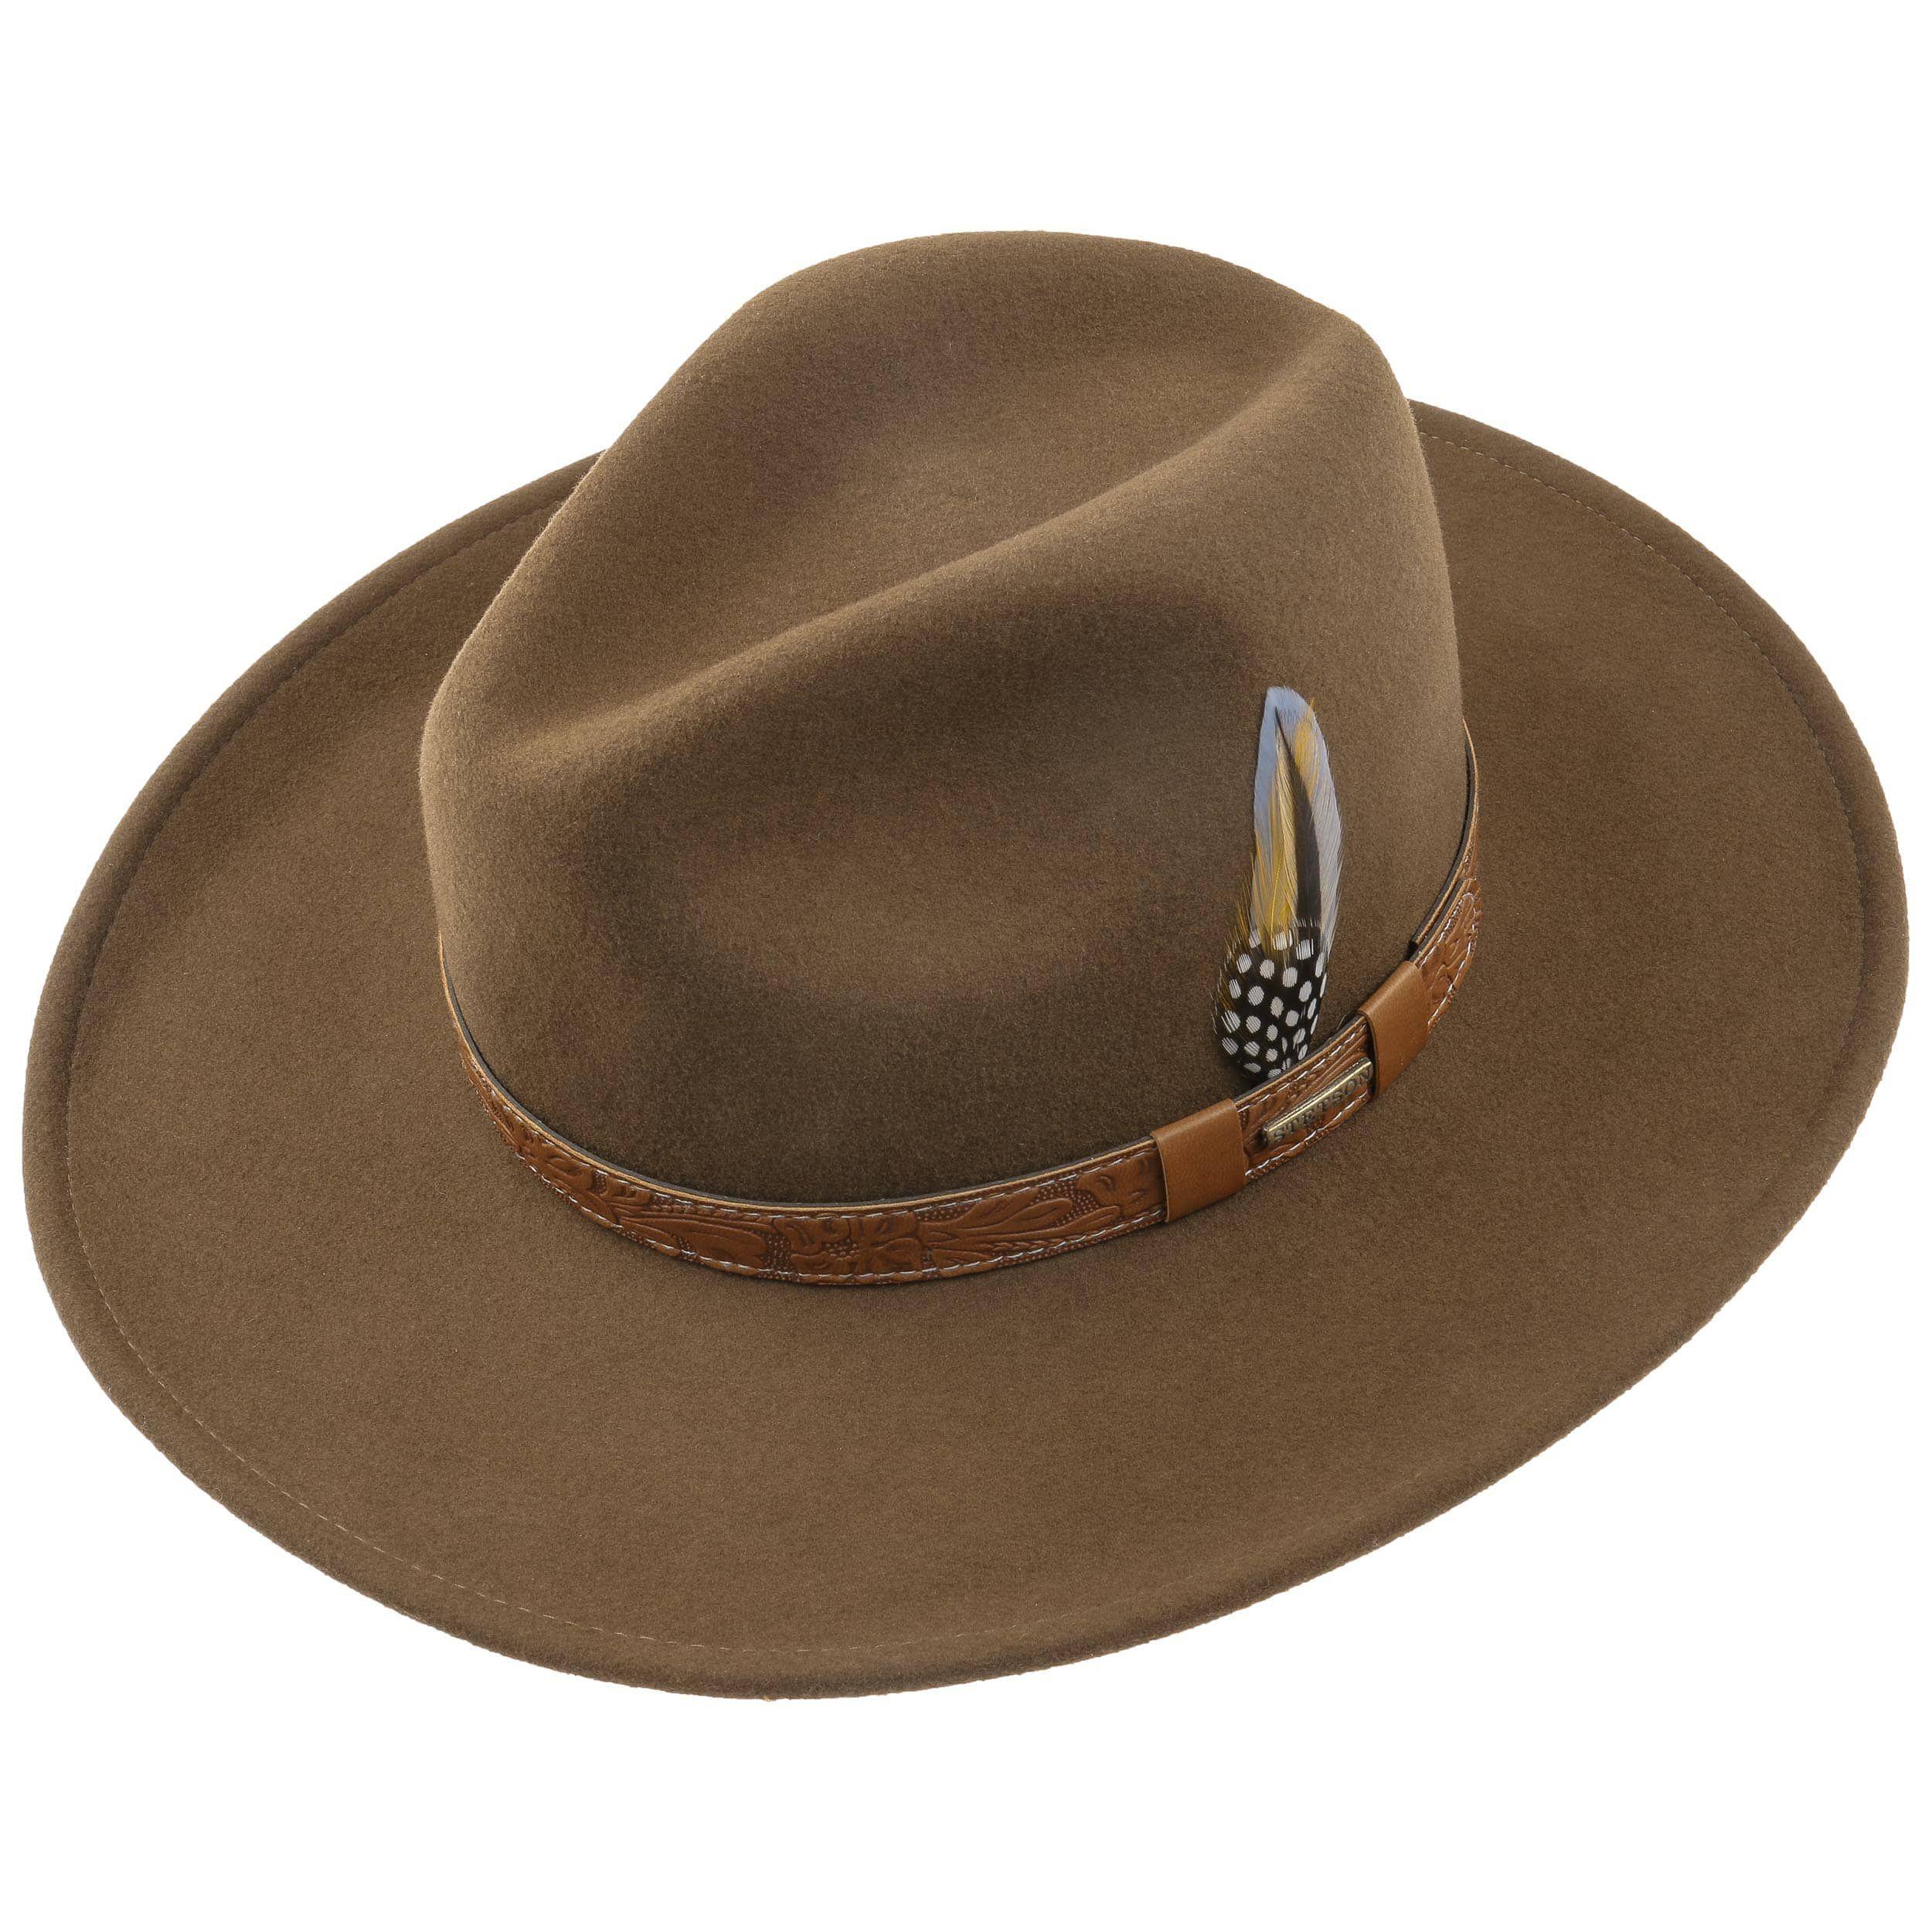 Wide Brim VitaFelt Cowboy Hat brown